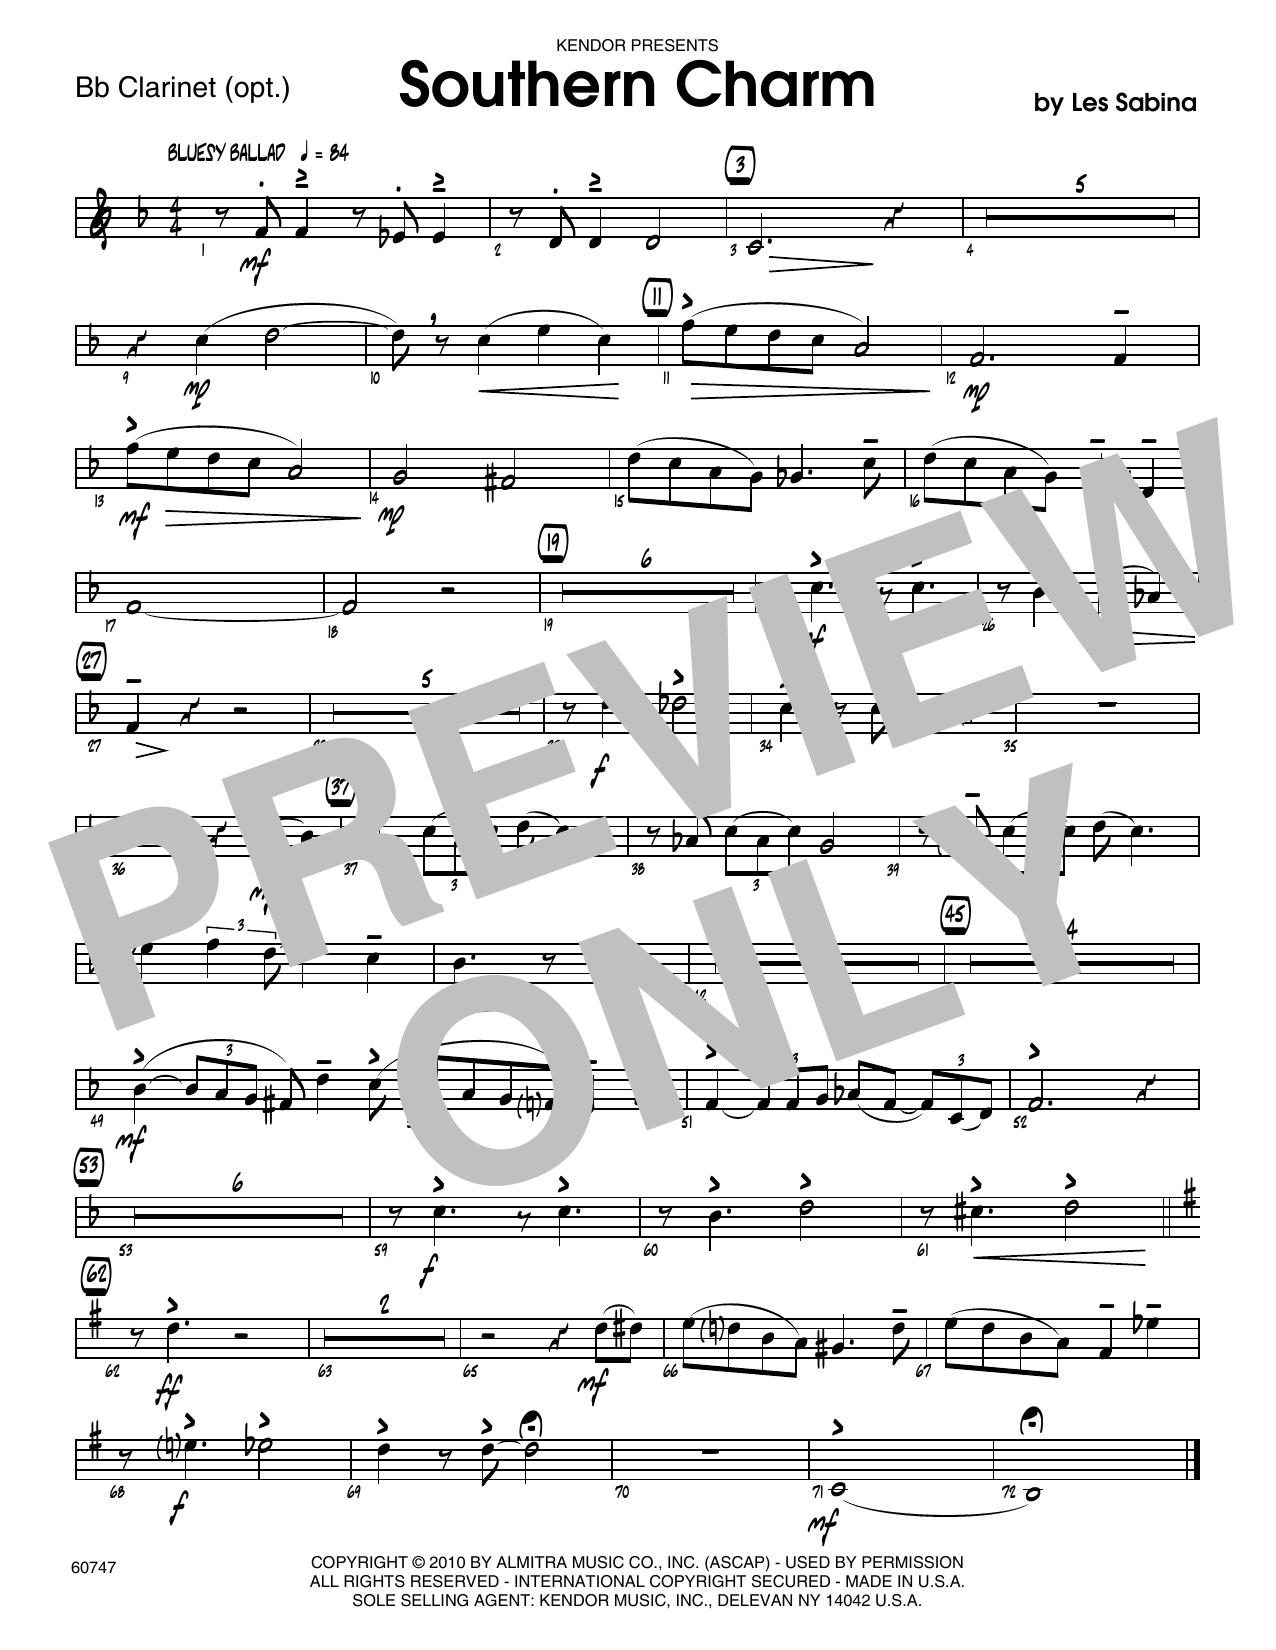 Southern Charm - Bb Clarinet Sheet Music